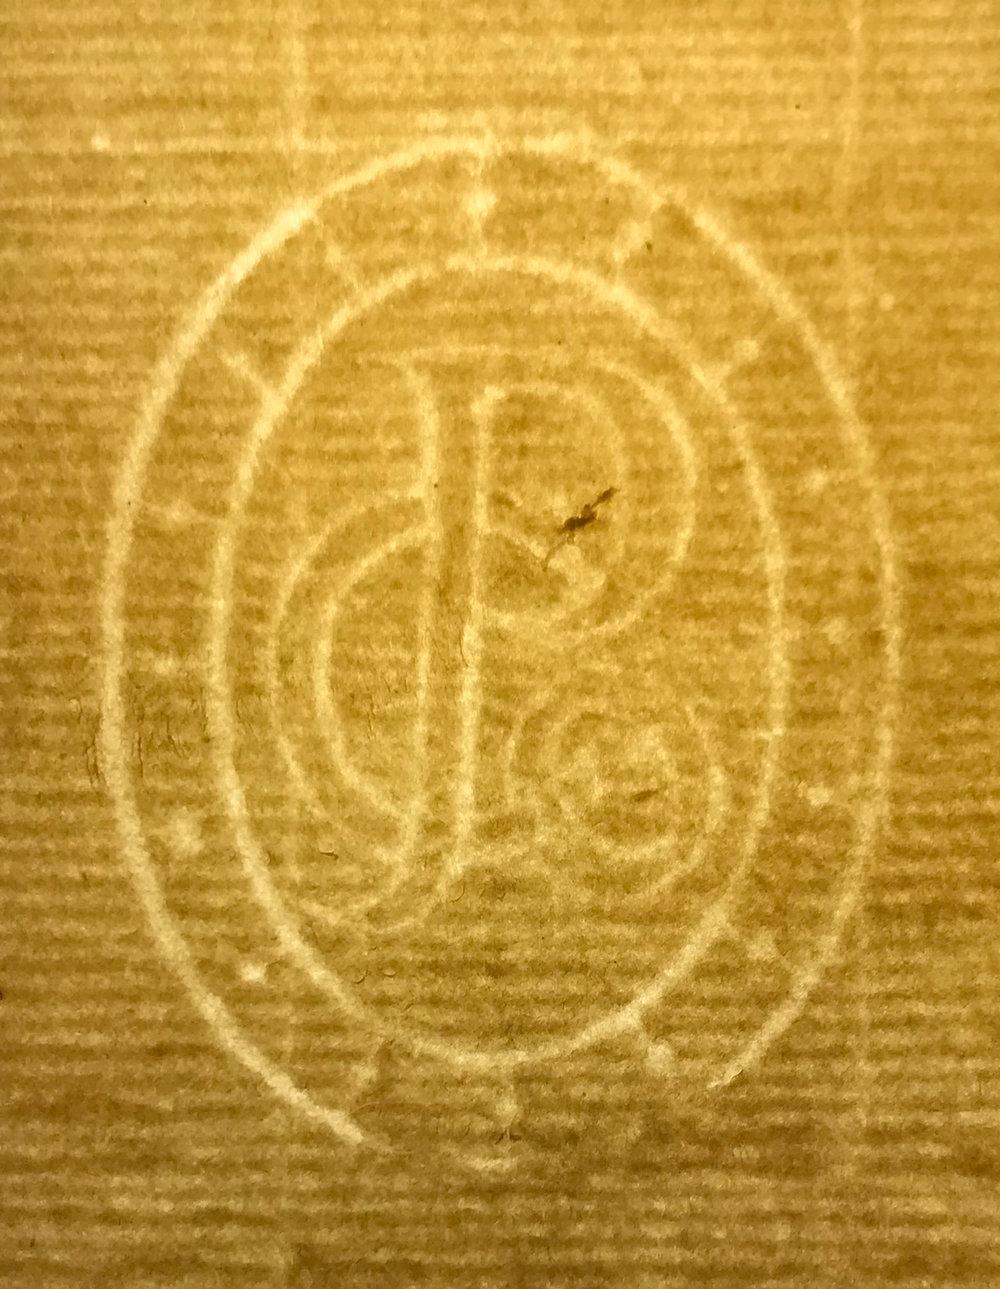 180601-san-marco-watermark-projet-02.jpg